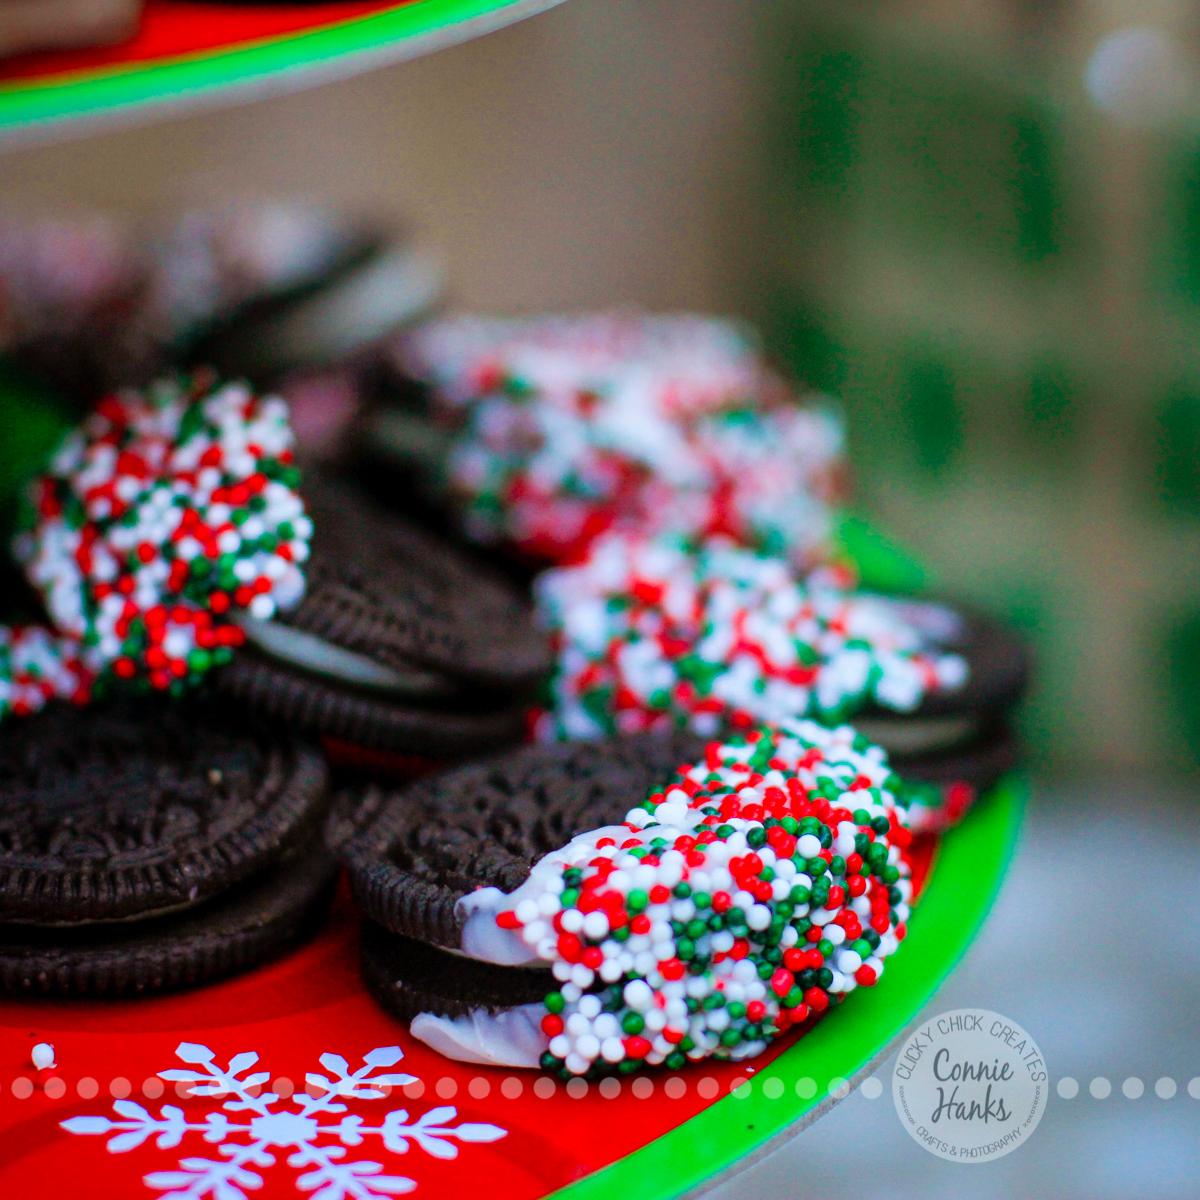 Connie Hanks Photography // ClickyChickCreates.com // oreos, sprinkles, chocolate, treats, Christmas, easy, yum!